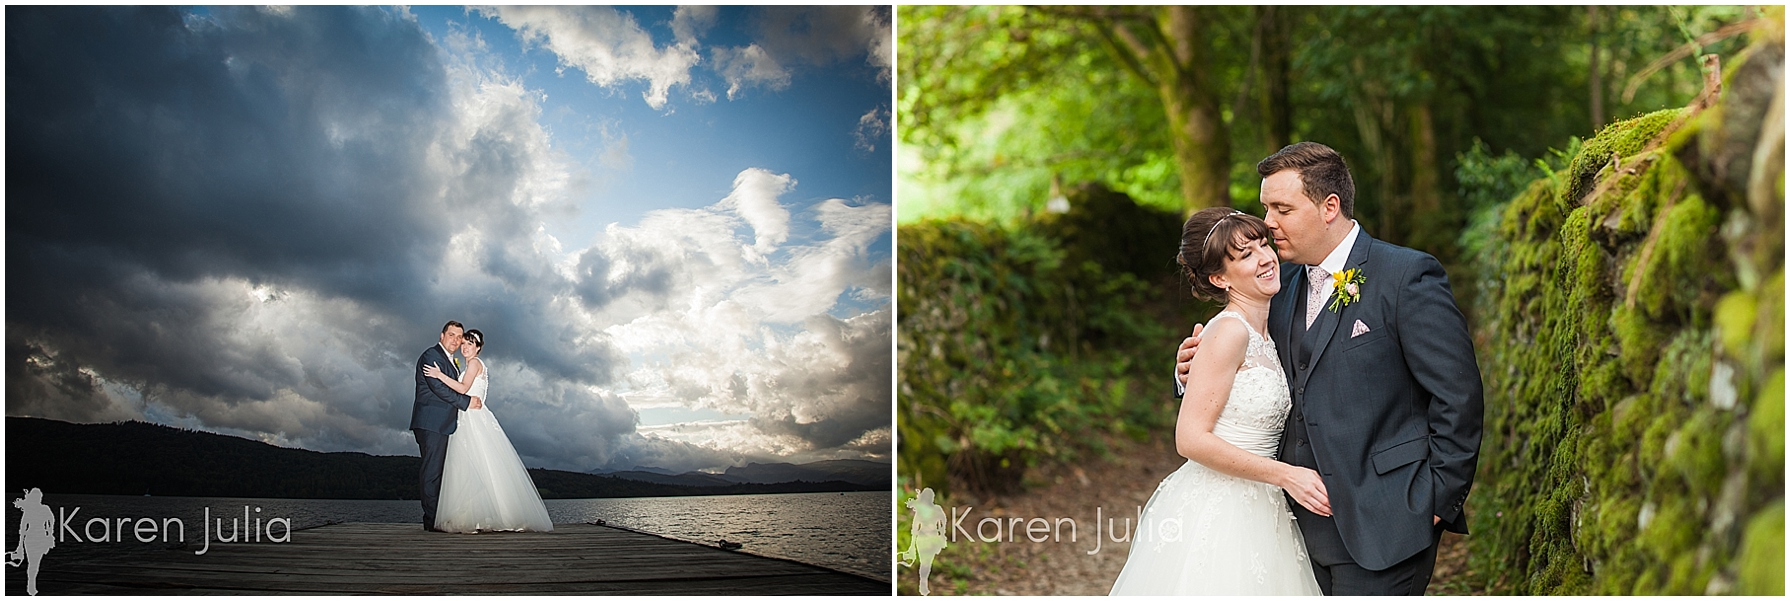 Miller-Howe-Hotel-Summer-Wedding-Photography-22